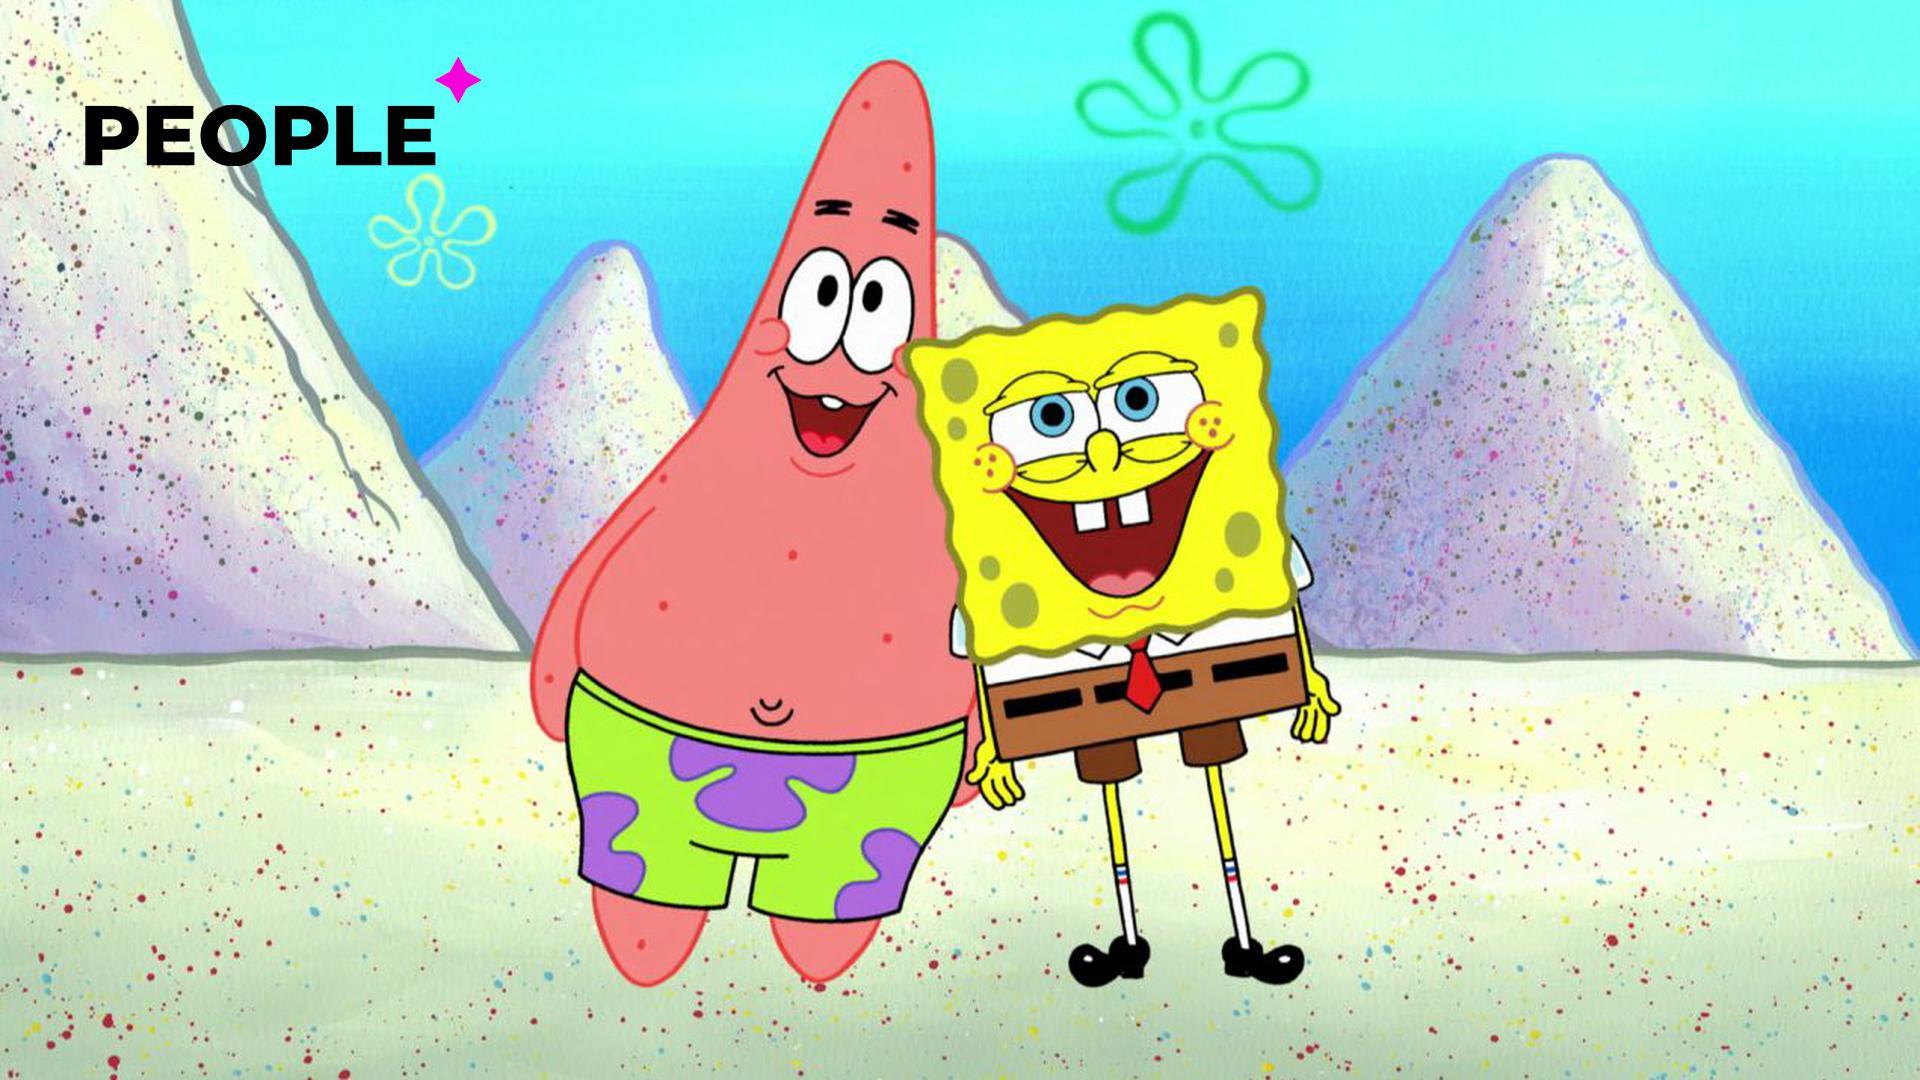 На дне океана обнаружили настоящих Губку Боба и Патрика — фото